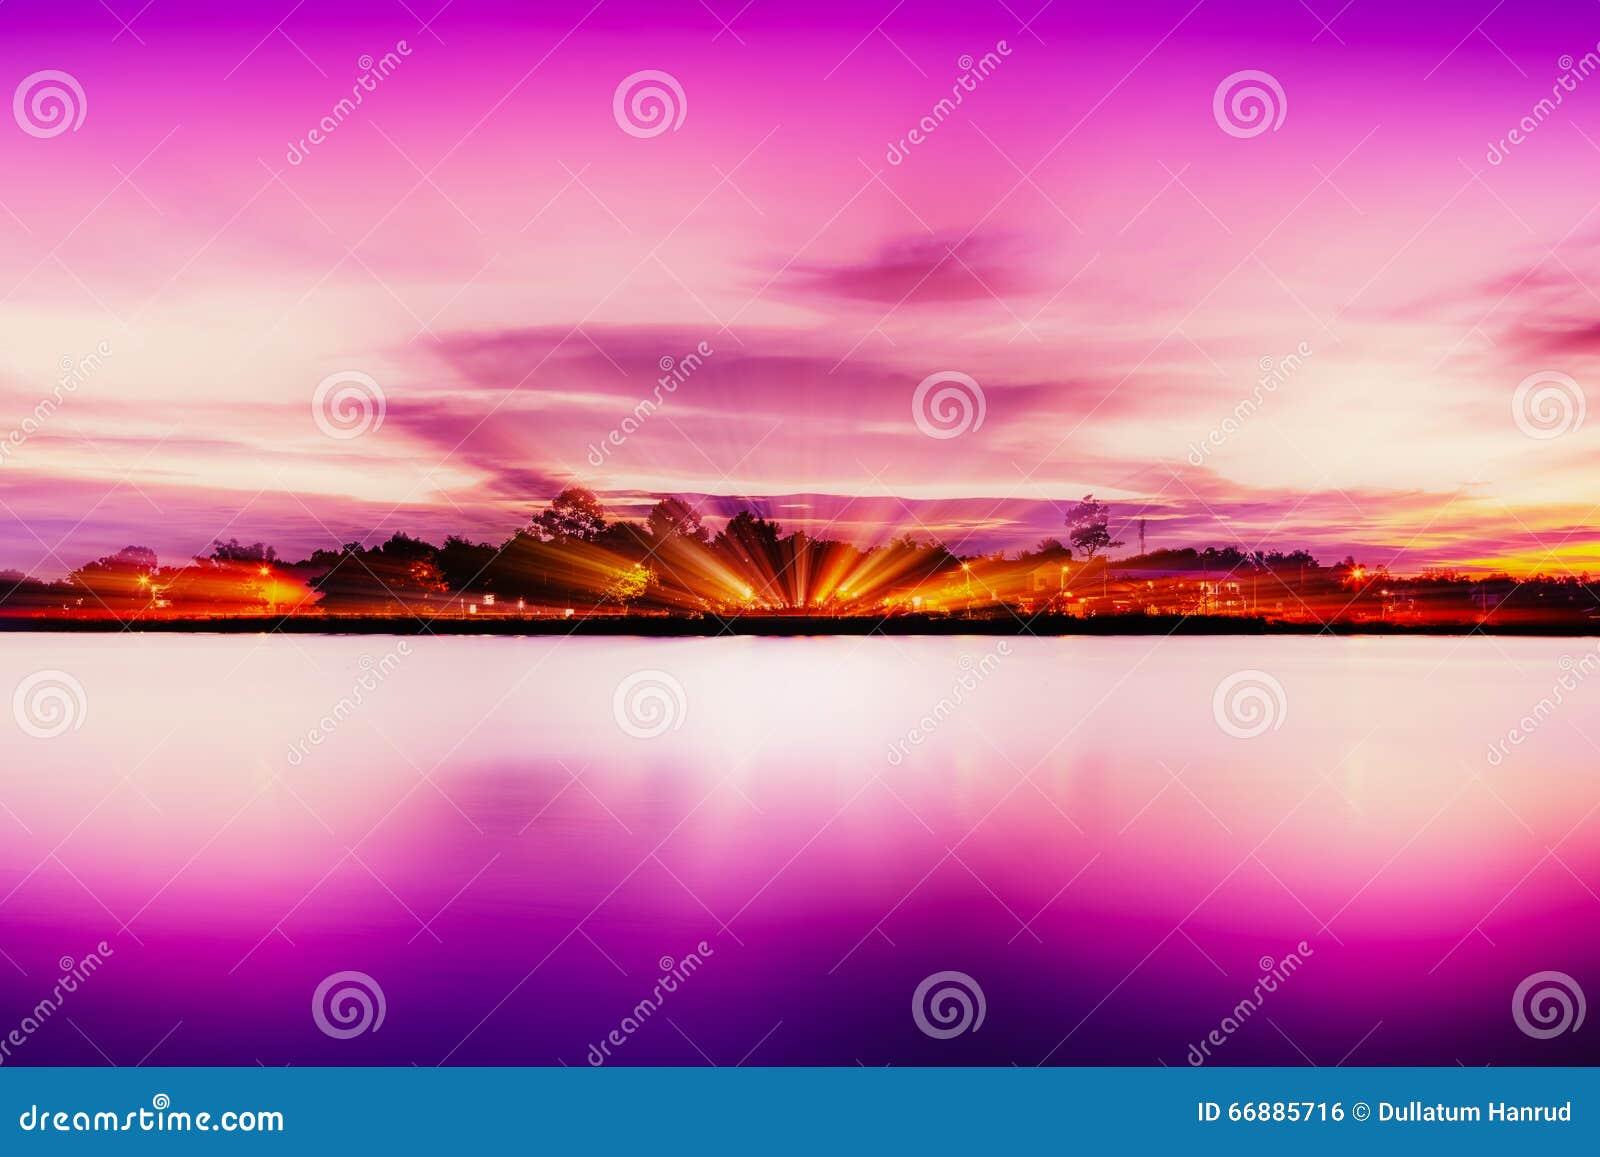 Ufer der Seestunde im Rosa